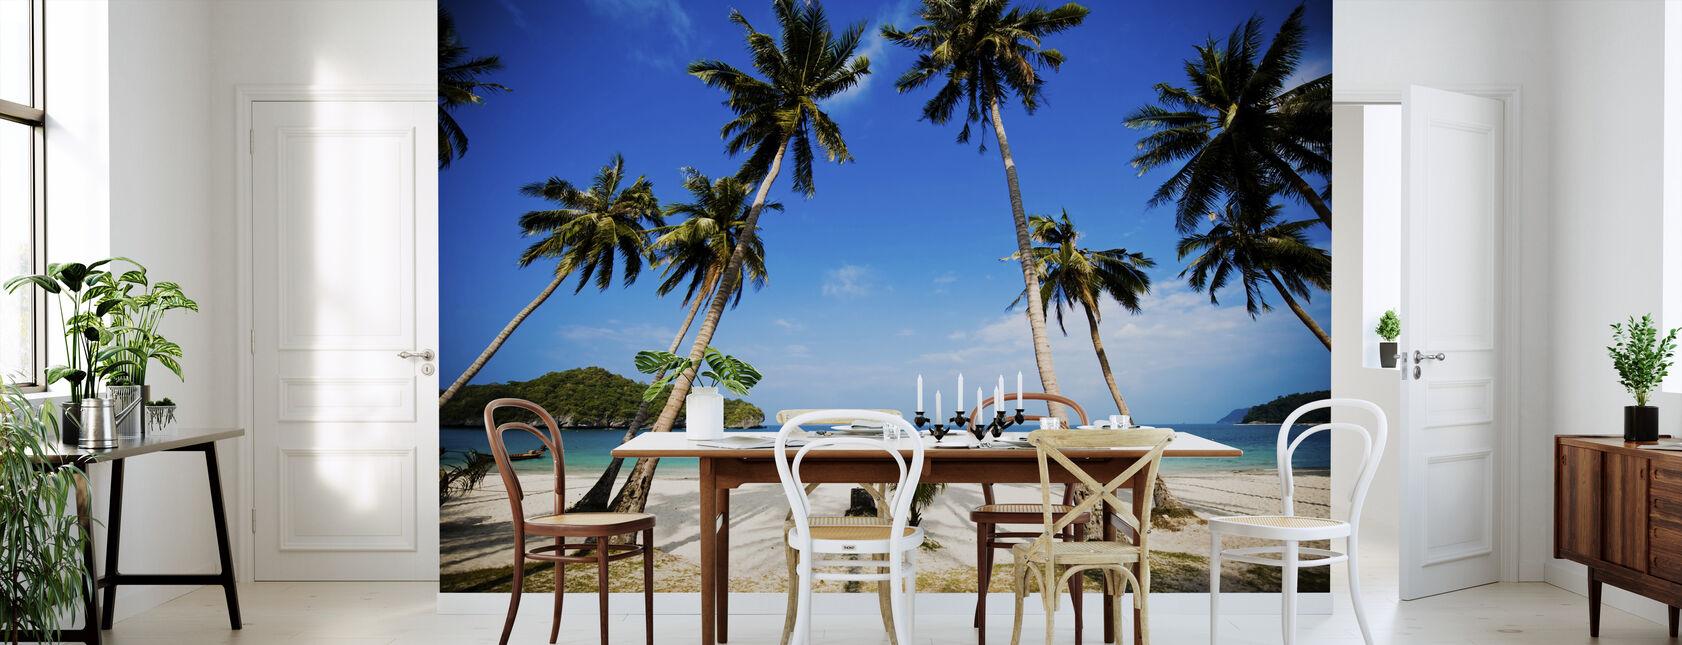 Palme da cocco, Thailandia - Carta da parati - Cucina